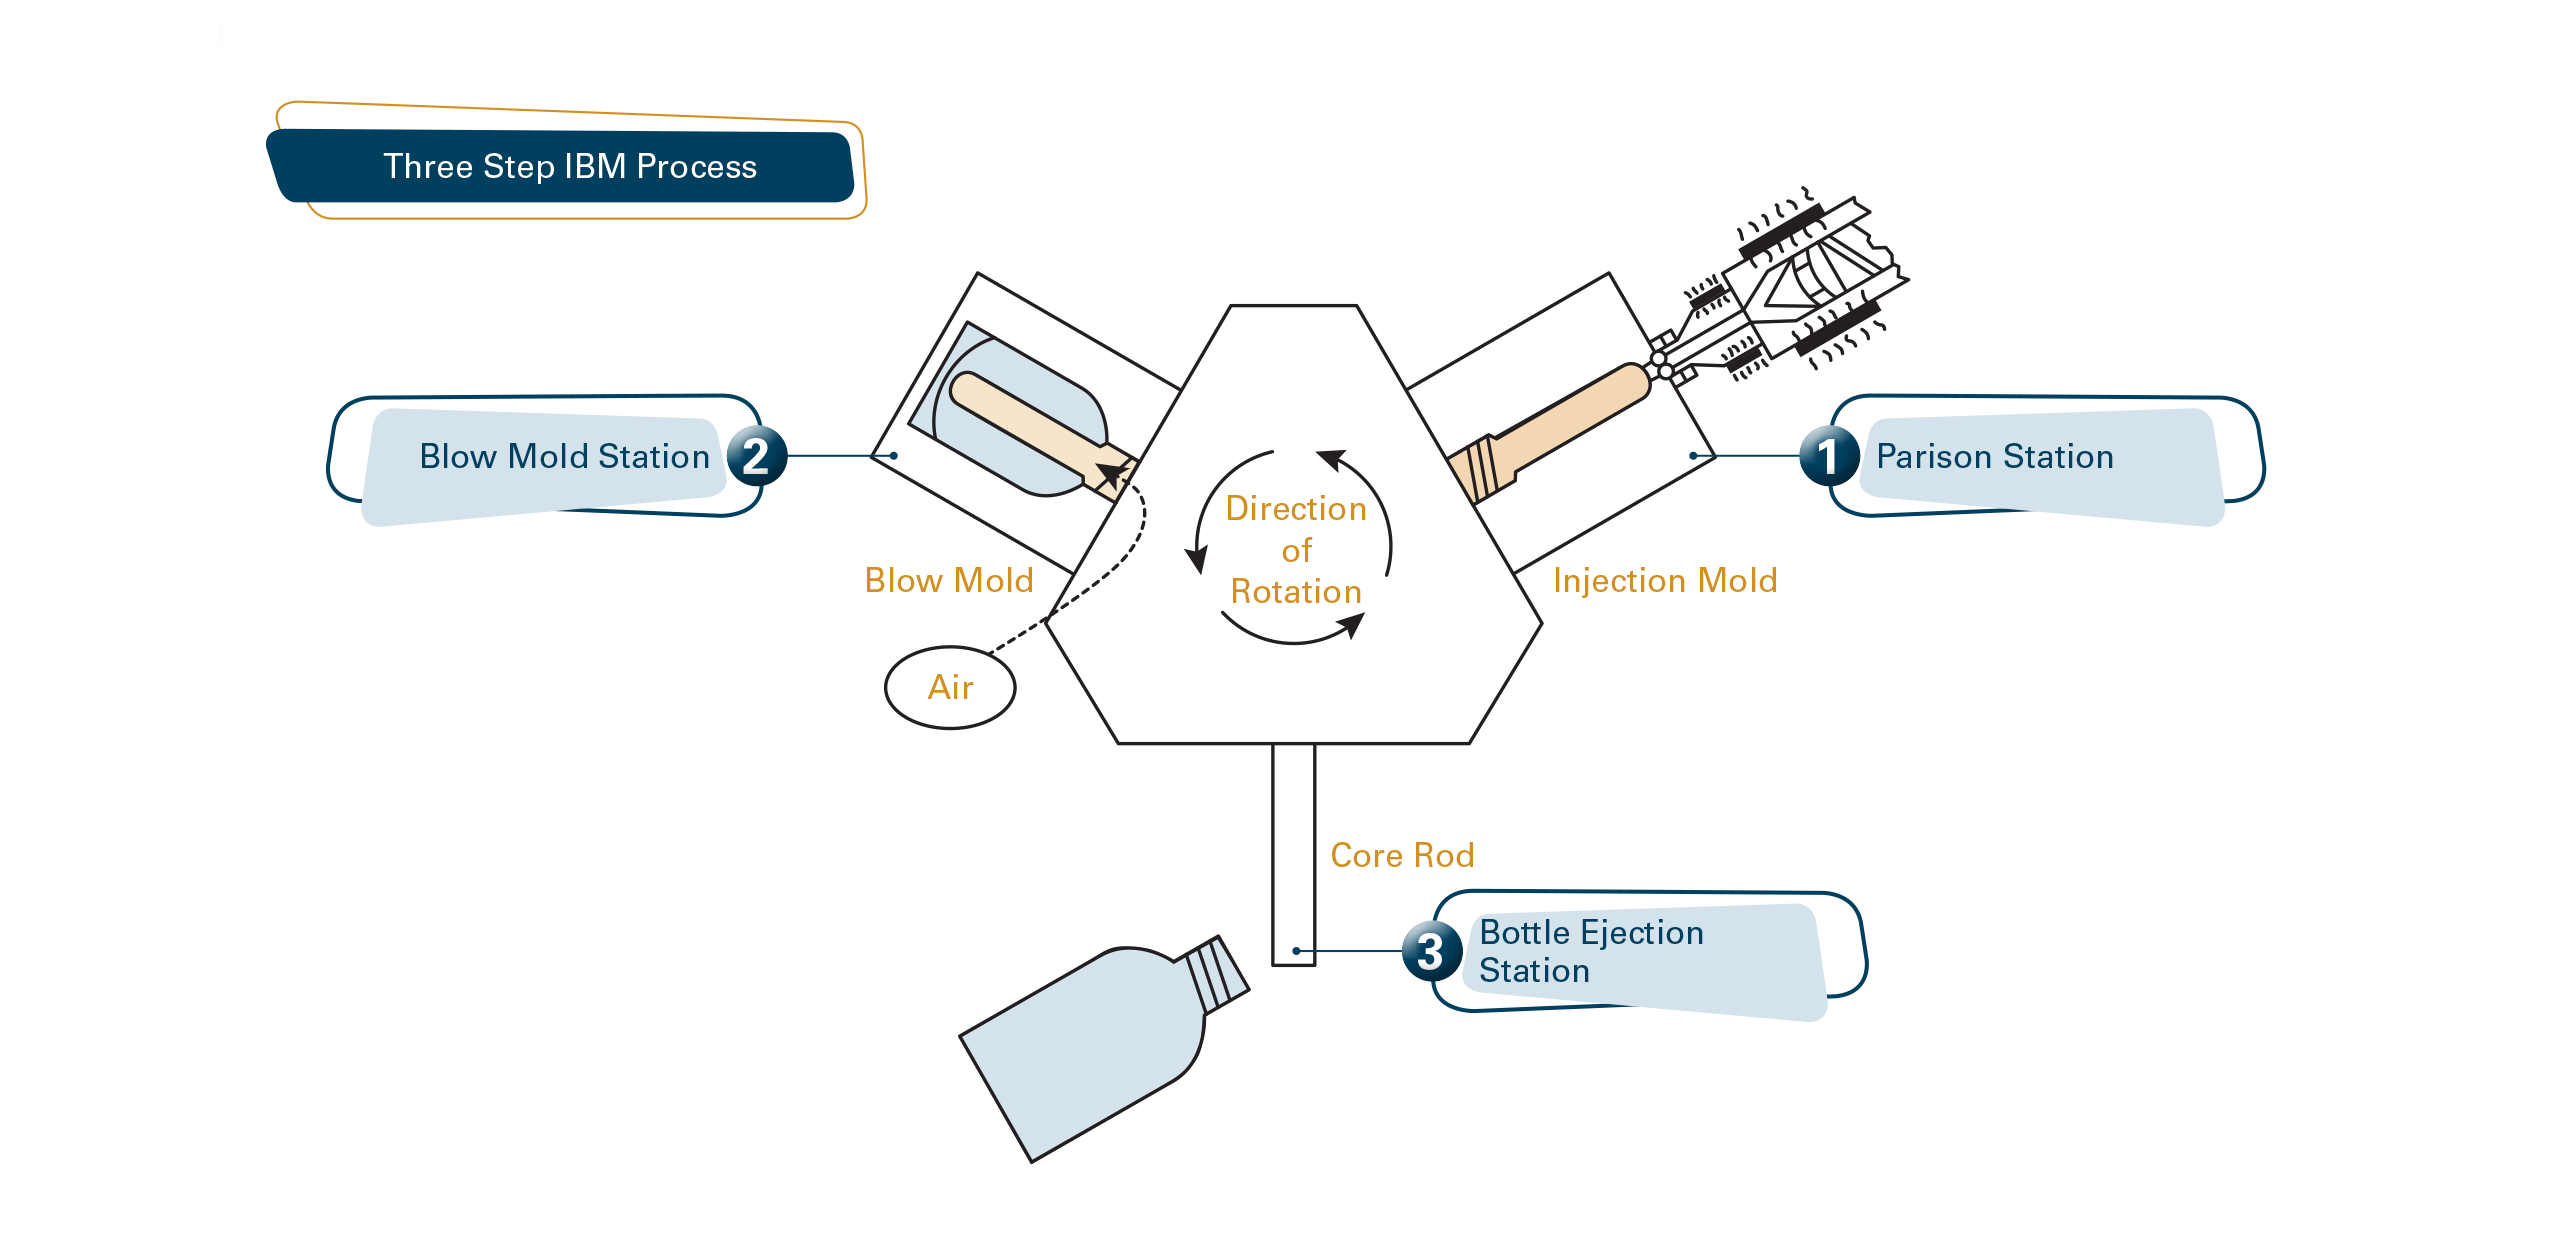 Three Step IBM Process